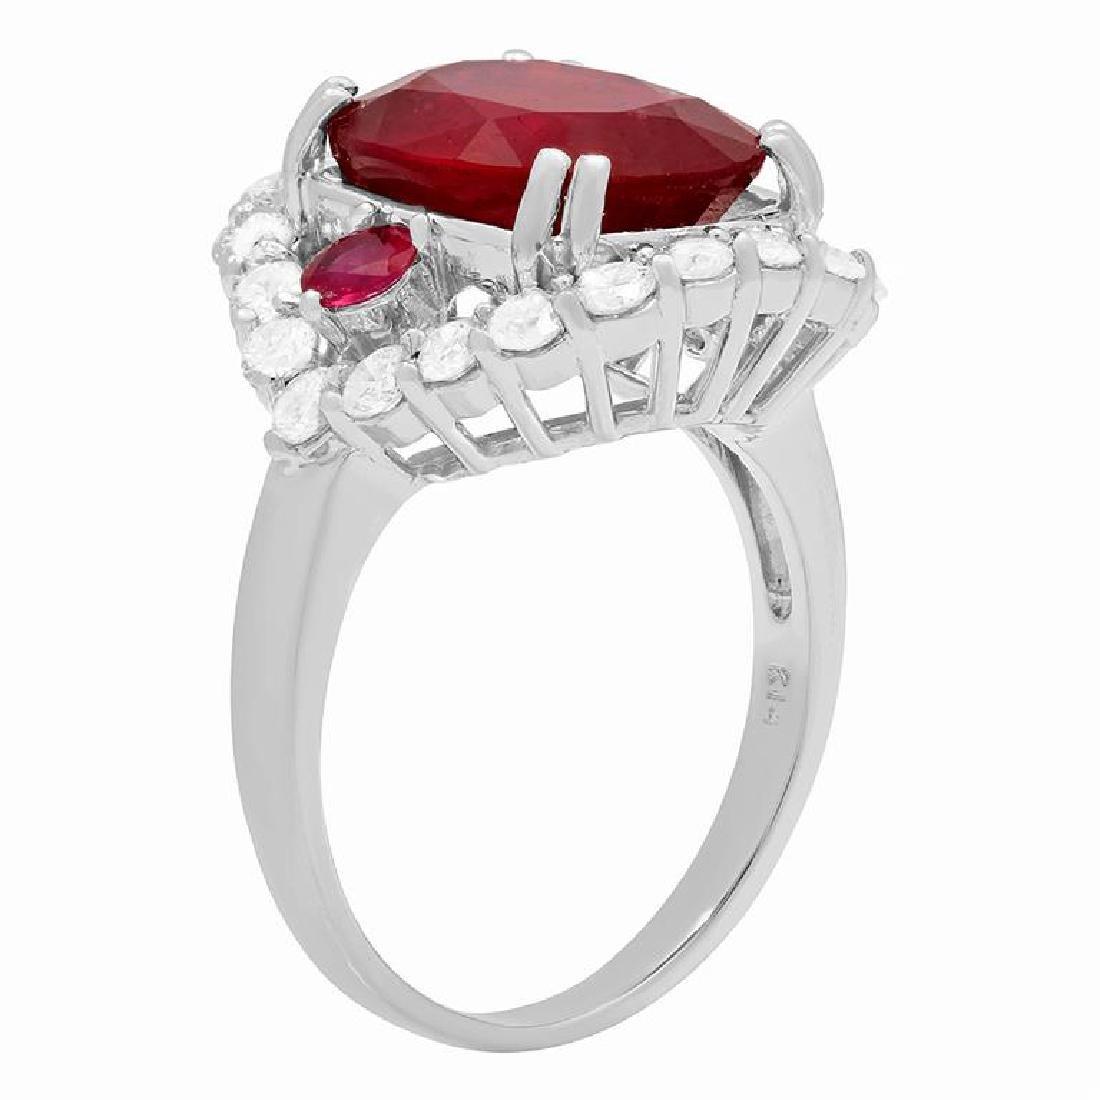 14k White Gold 7.00ct & 0.40ct Ruby 1.22ct Diamond Ring - 2